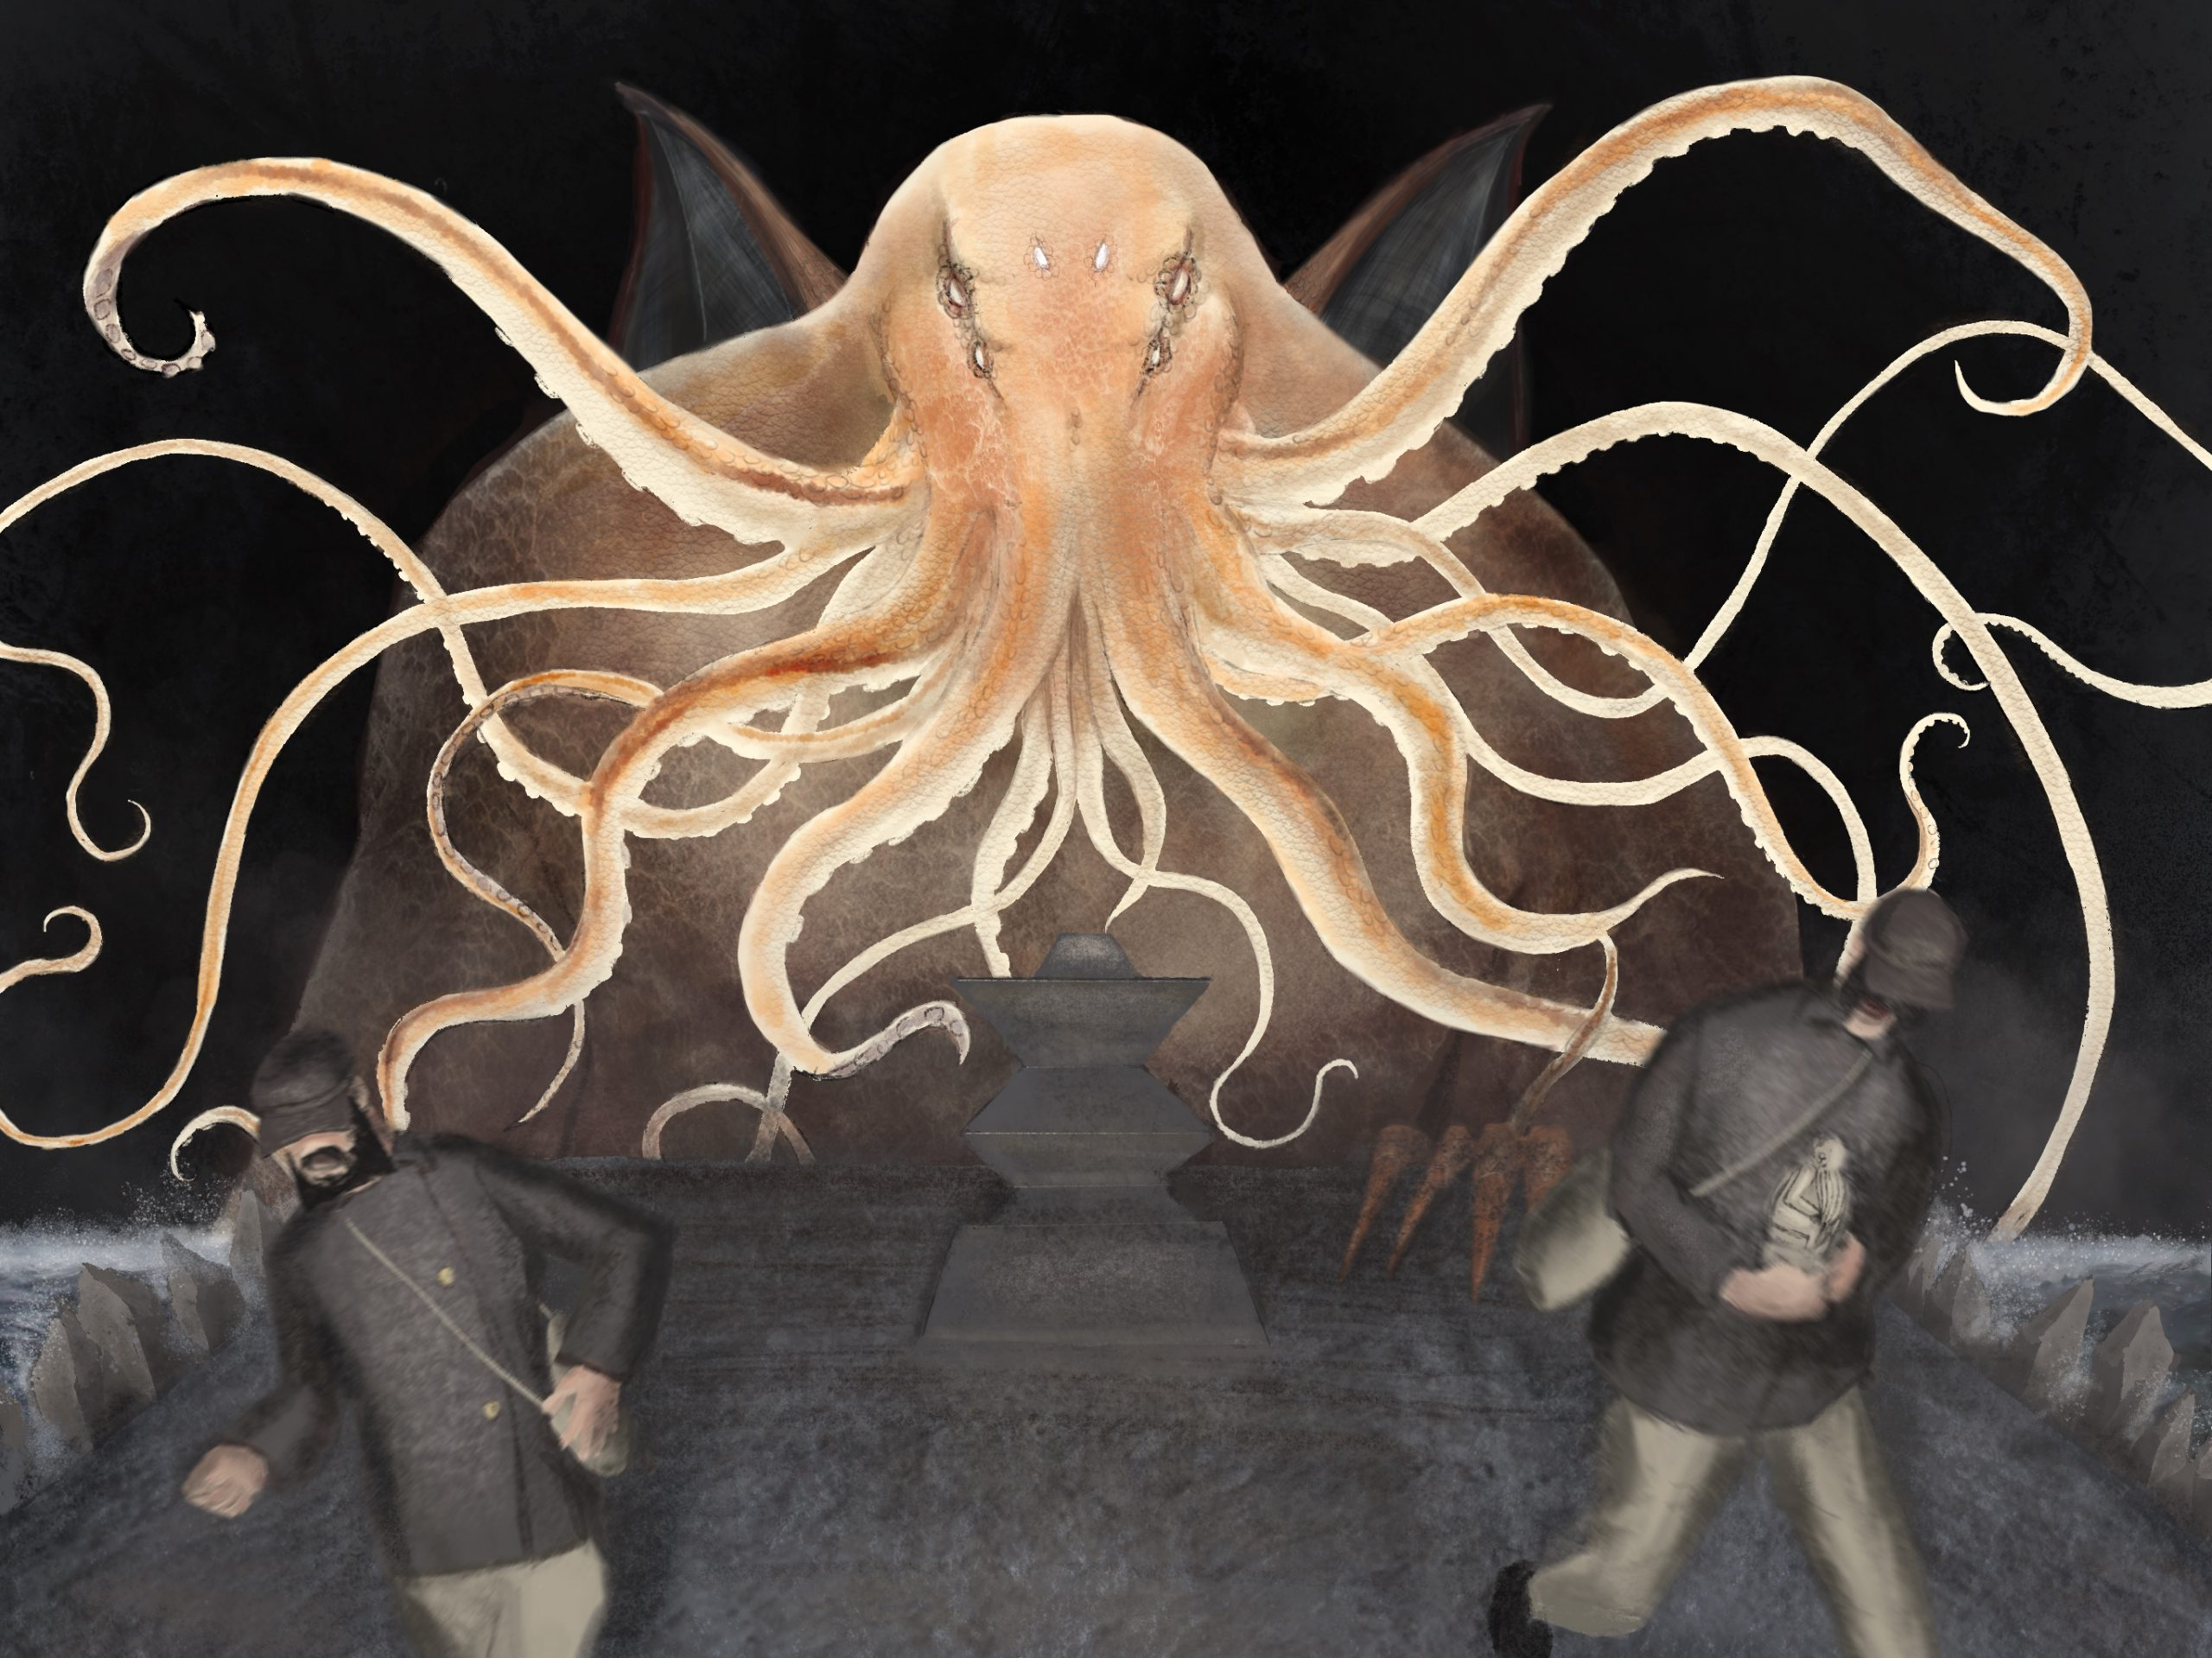 The Awakening of Lovecraft's Cthulhu - peinture numerique de Sebastien Loghman